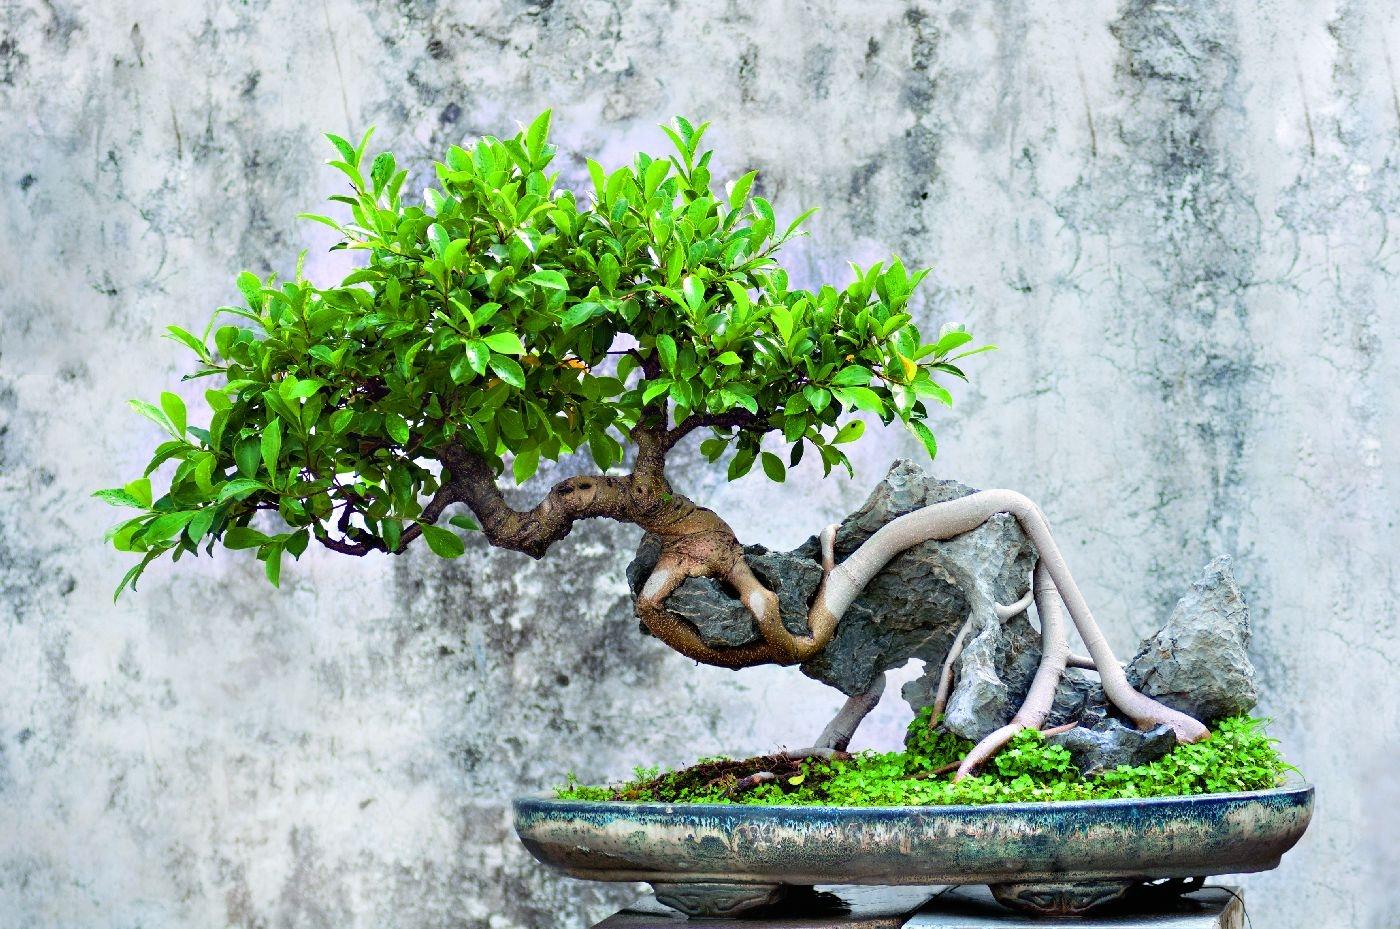 Fikusy Fikus Ginseng Fikus Benjamina Ficus Bonsai